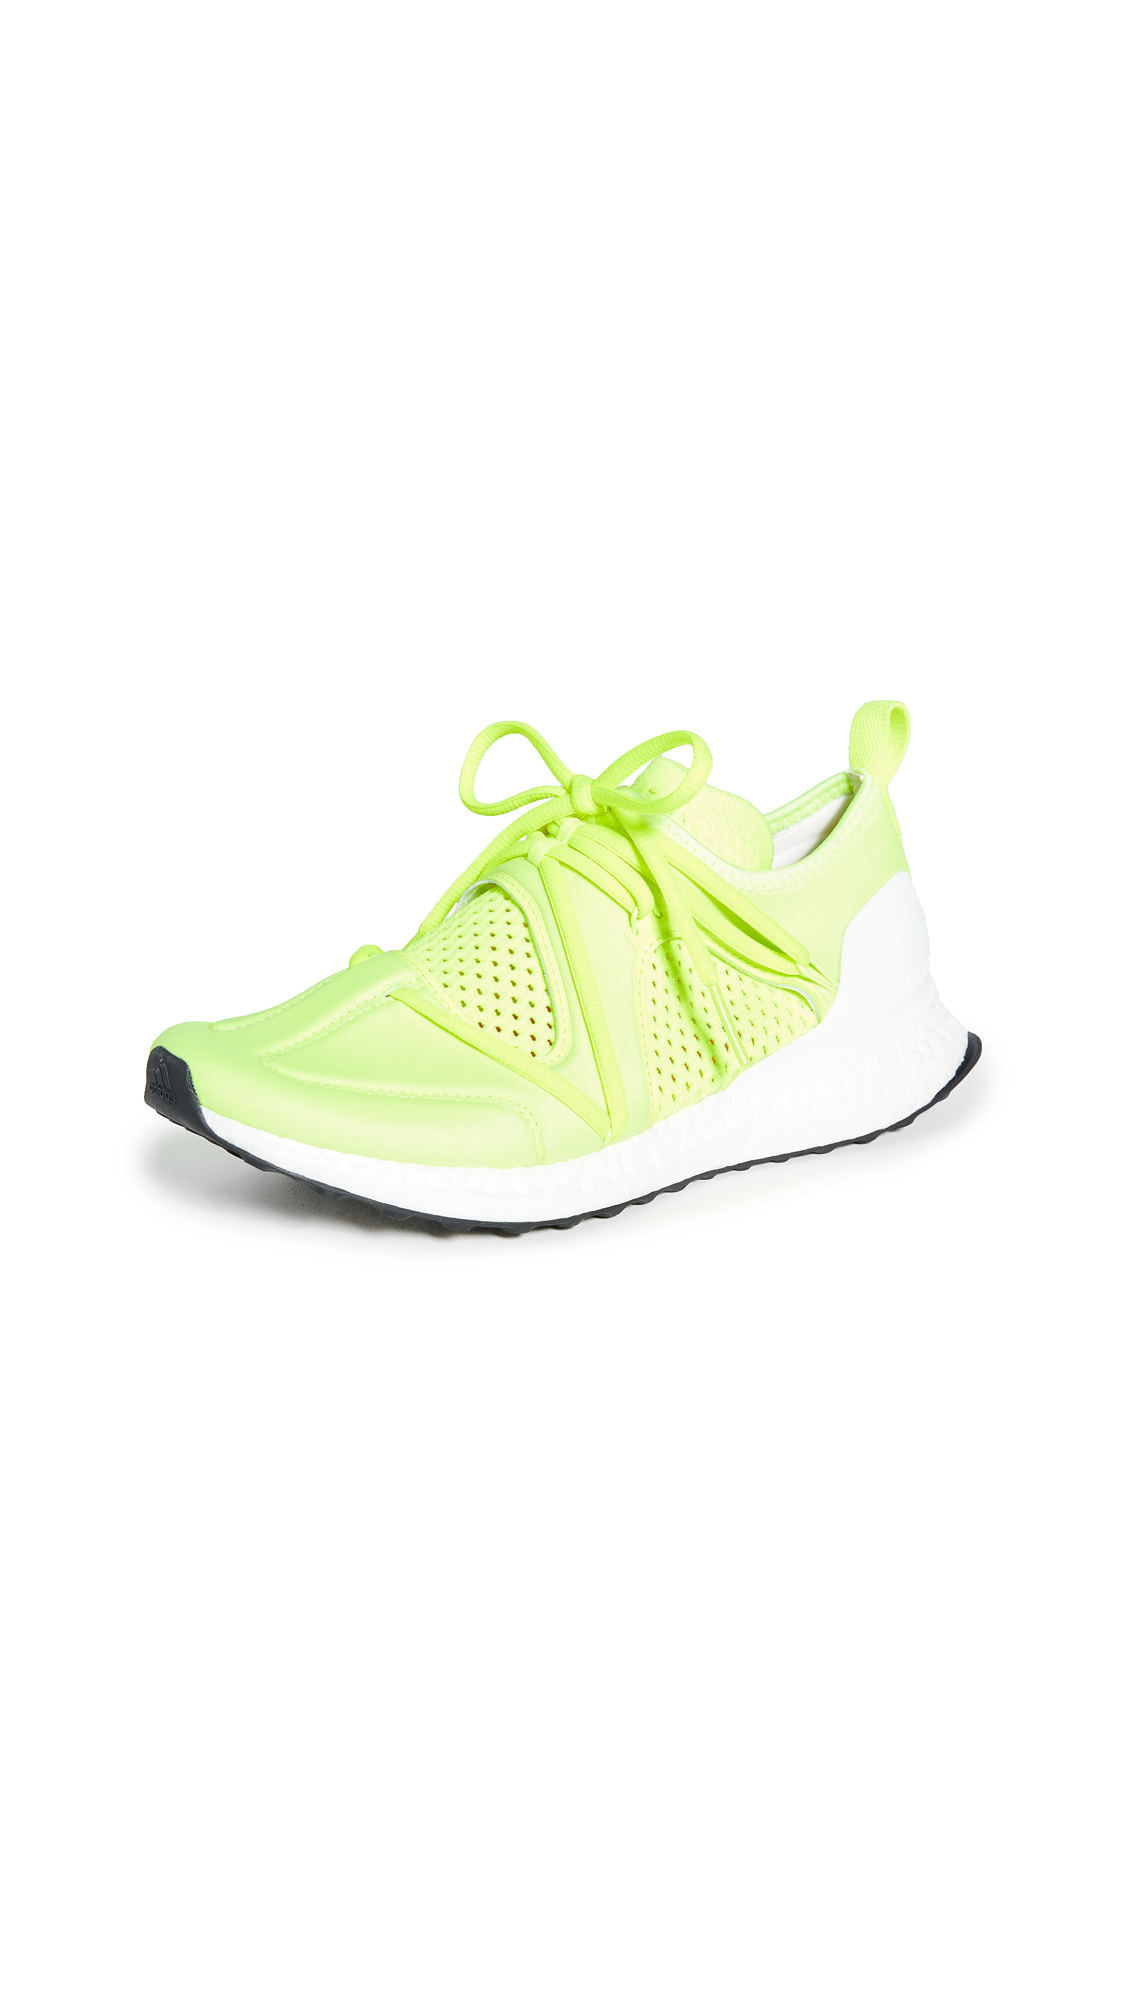 adidas by Stella McCartney UltraBOOST T.S. Neon Sneakers - Solar Yellow/Cream White/White